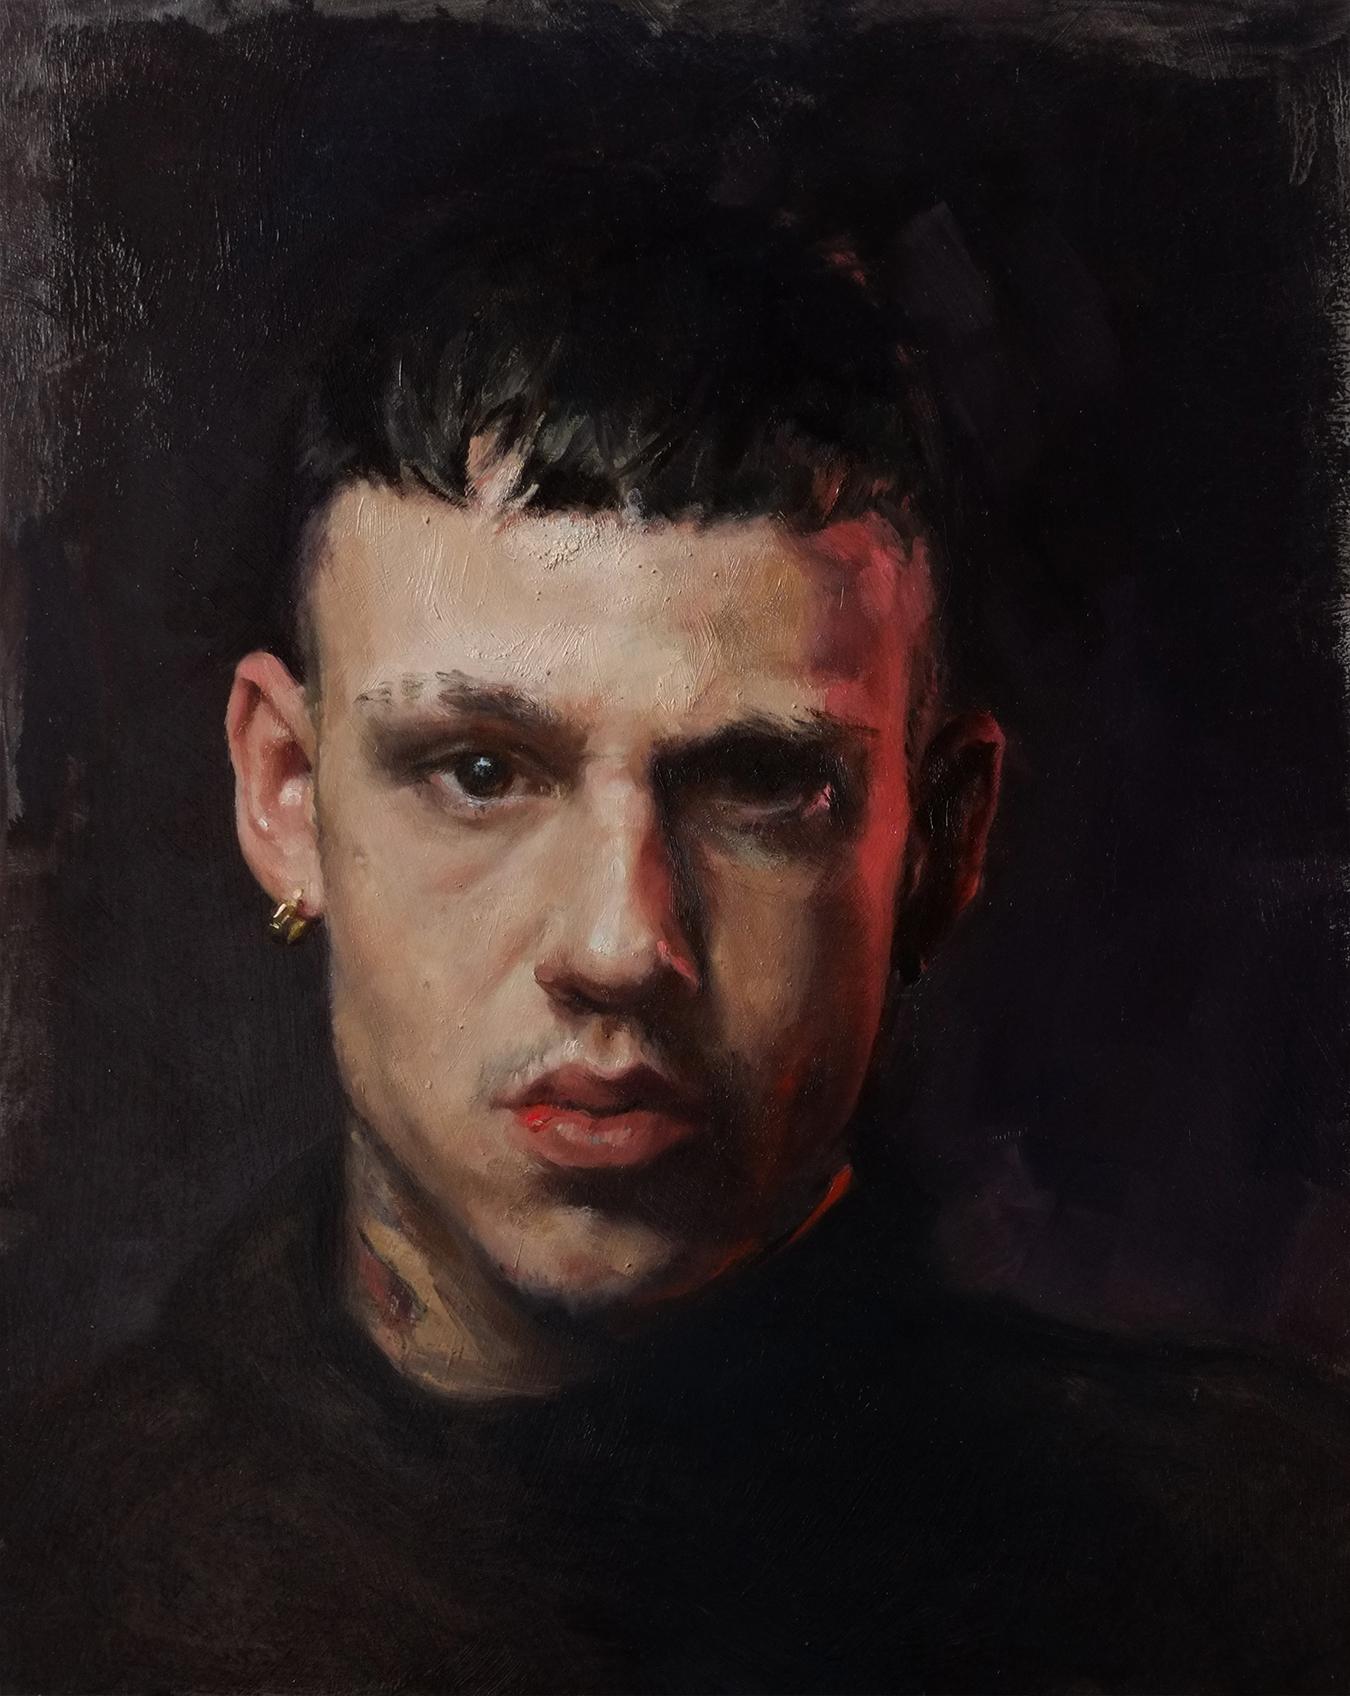 Alessandro Tomassetti  |  Still Ill  | Oil on Aluminum | 14 x 11 inches or 35 ½ x 28 cm